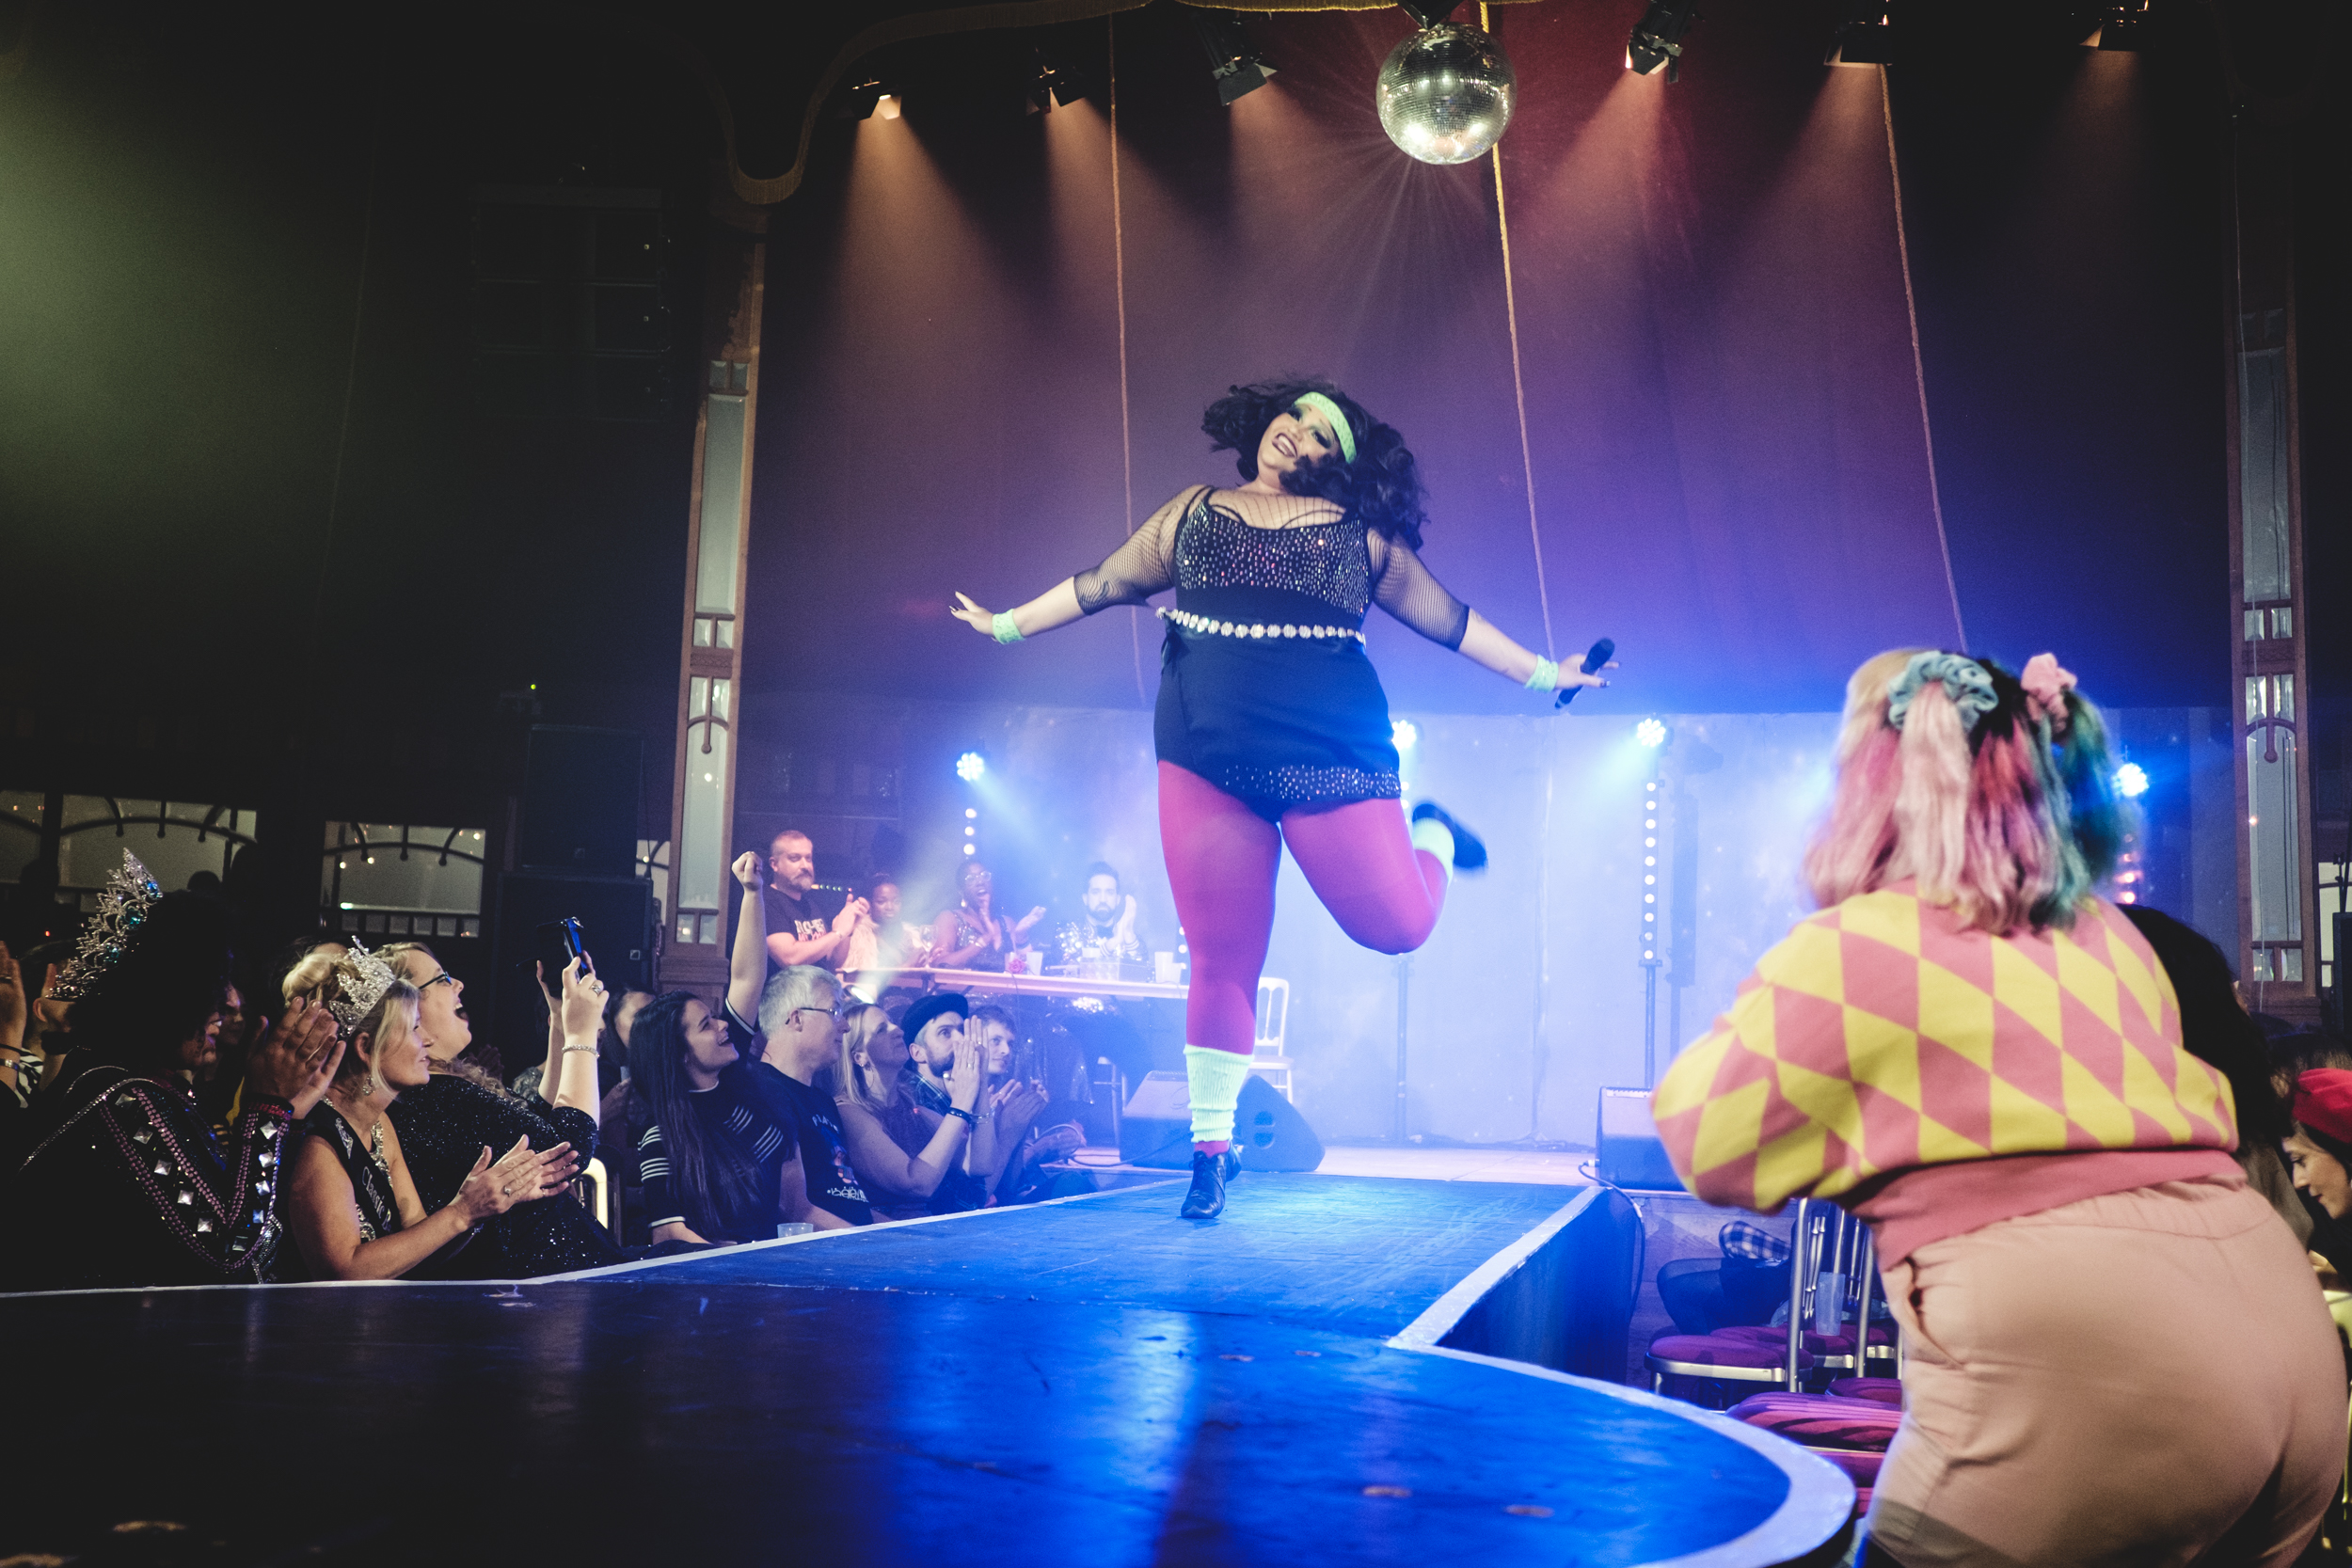 Bristol's Big Drag Pageant